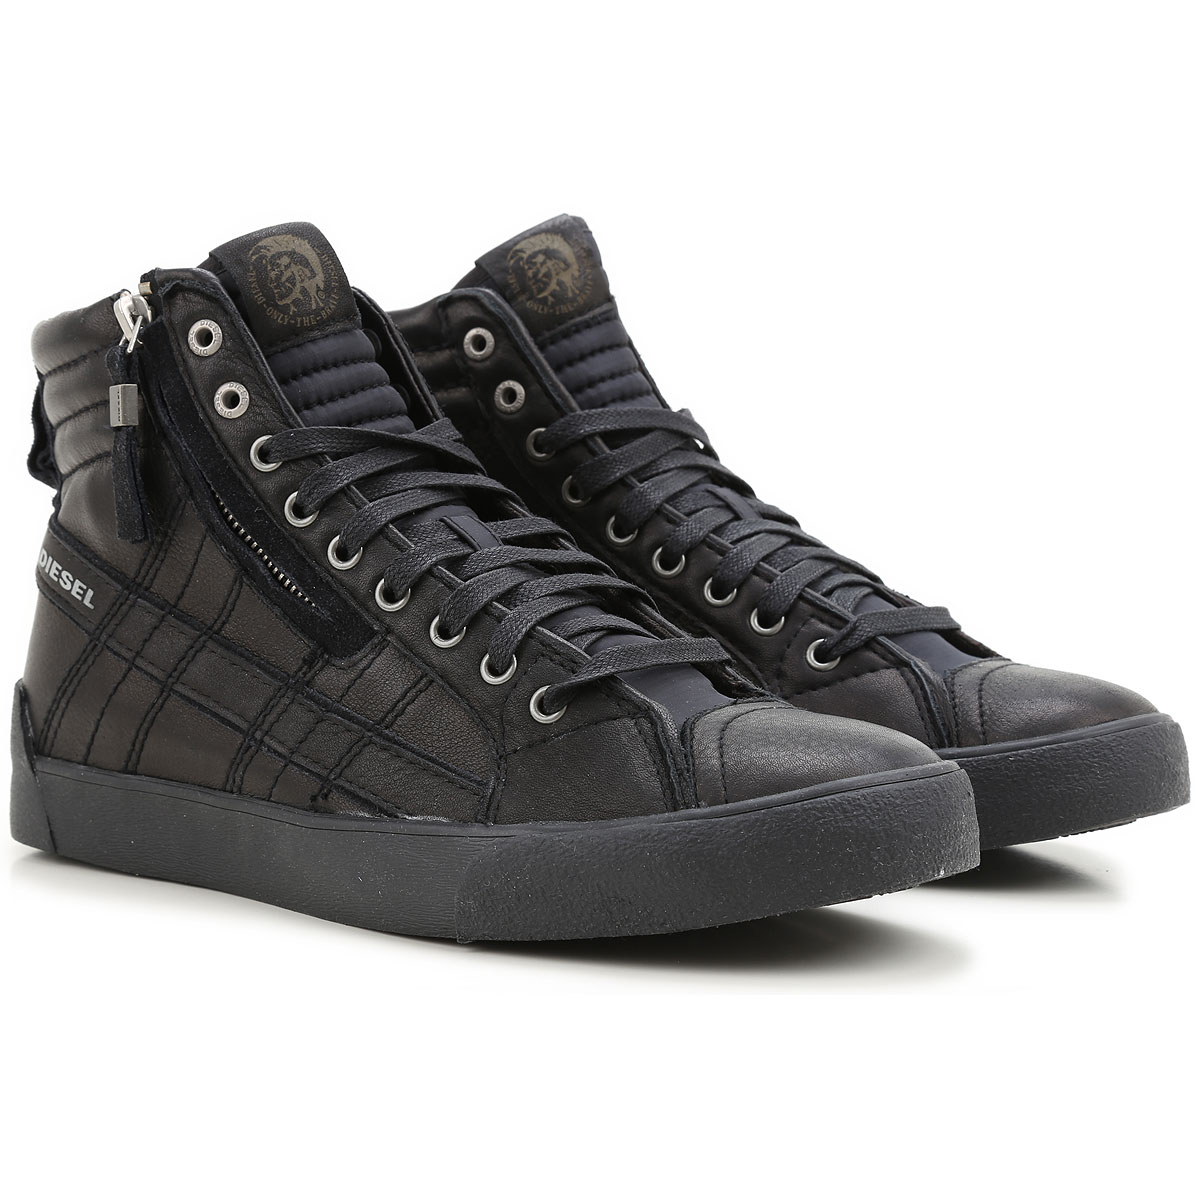 chaussures homme diesel code produit y01169 p0878 t8013. Black Bedroom Furniture Sets. Home Design Ideas